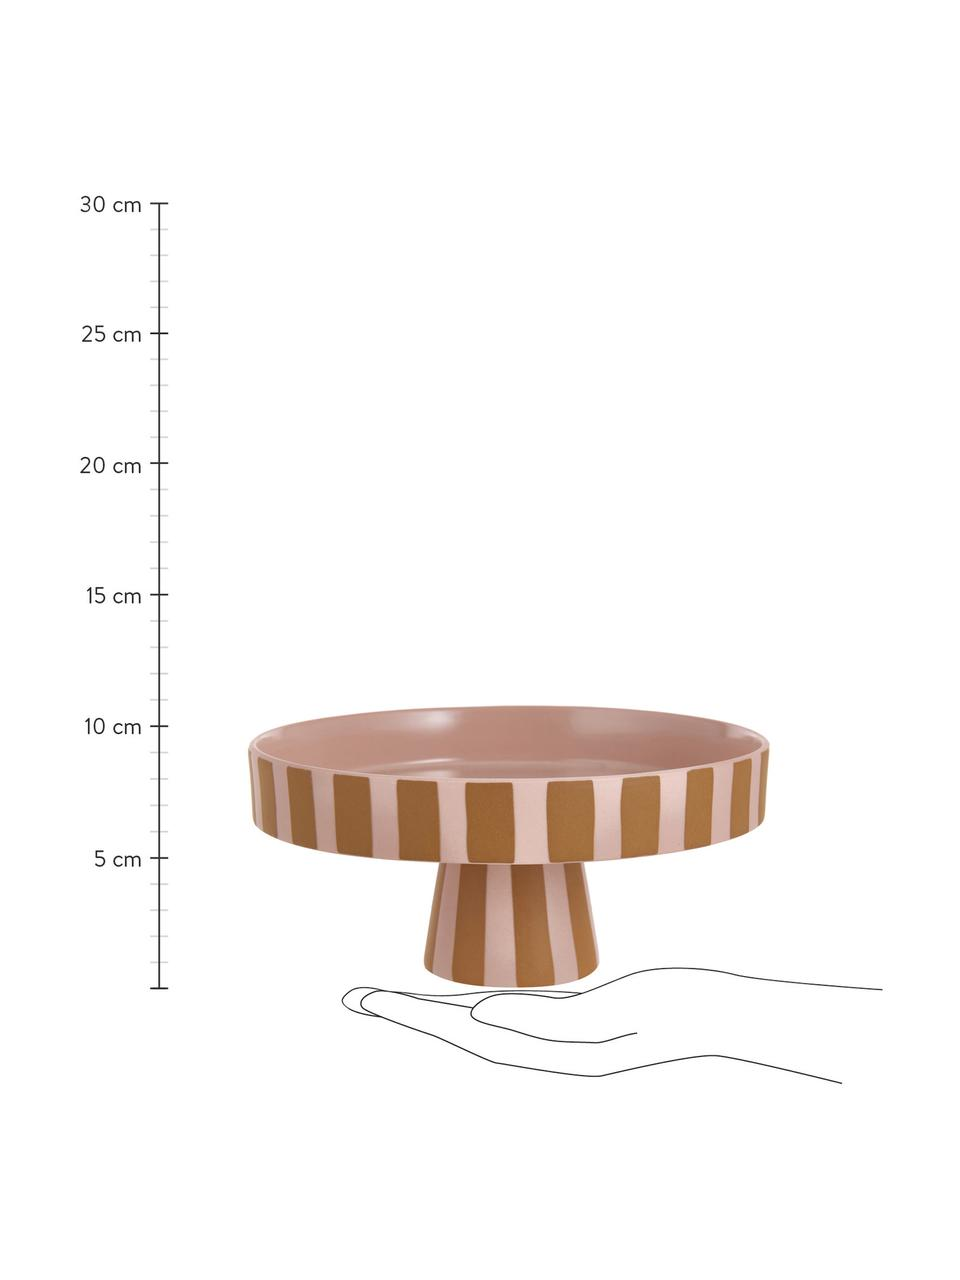 Keramisch serveerplateau Toppu in streeppatroon, Ø 20 cm, Keramiek, Karamelbruin, roze, Ø 20 x H 9 cm